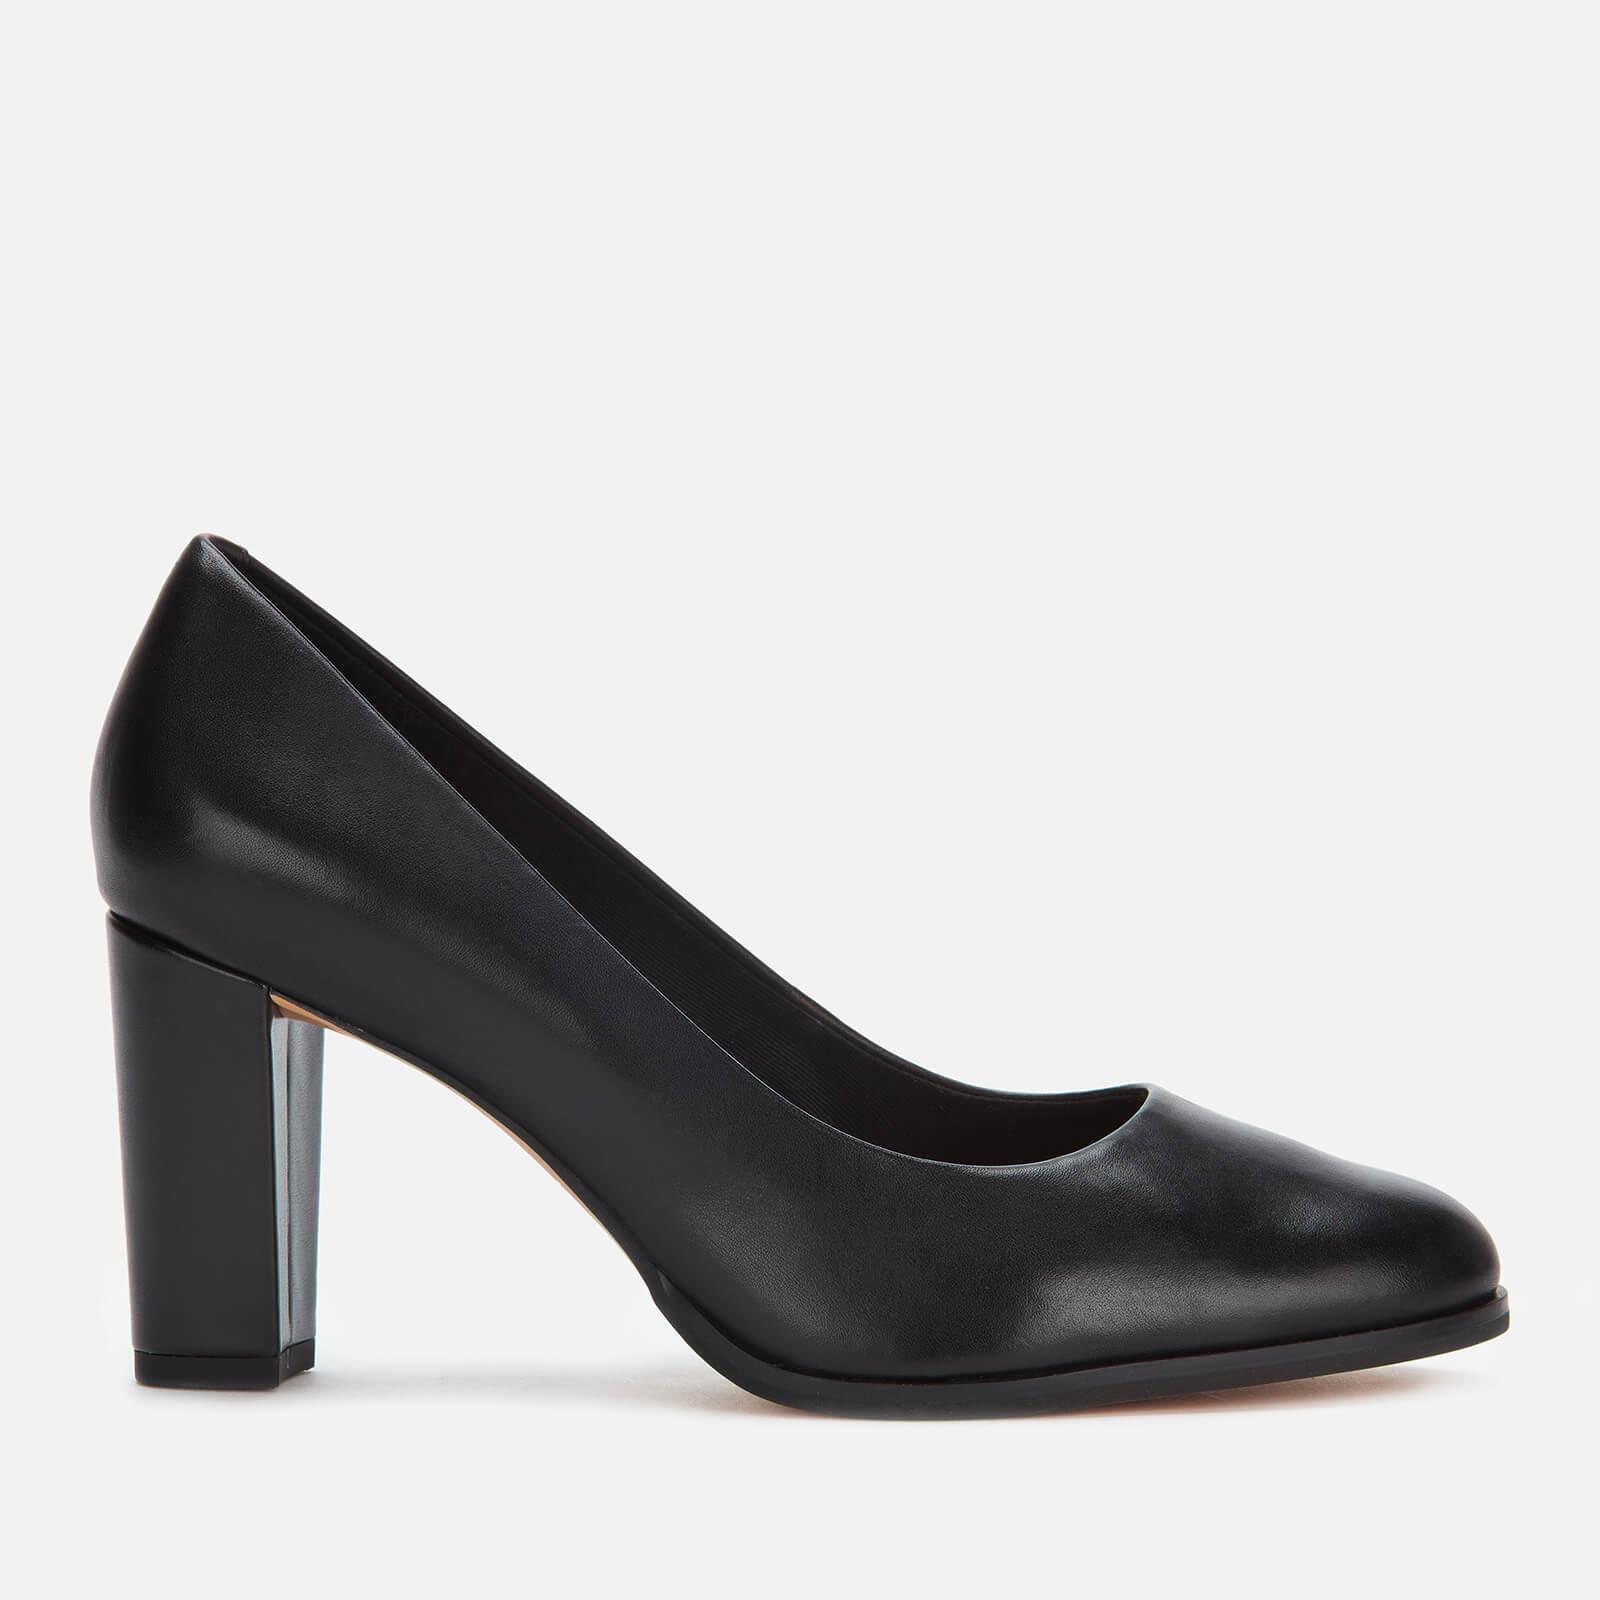 Clarks Women's Kaylin Cara Leather Court Shoes - Black - UK 5